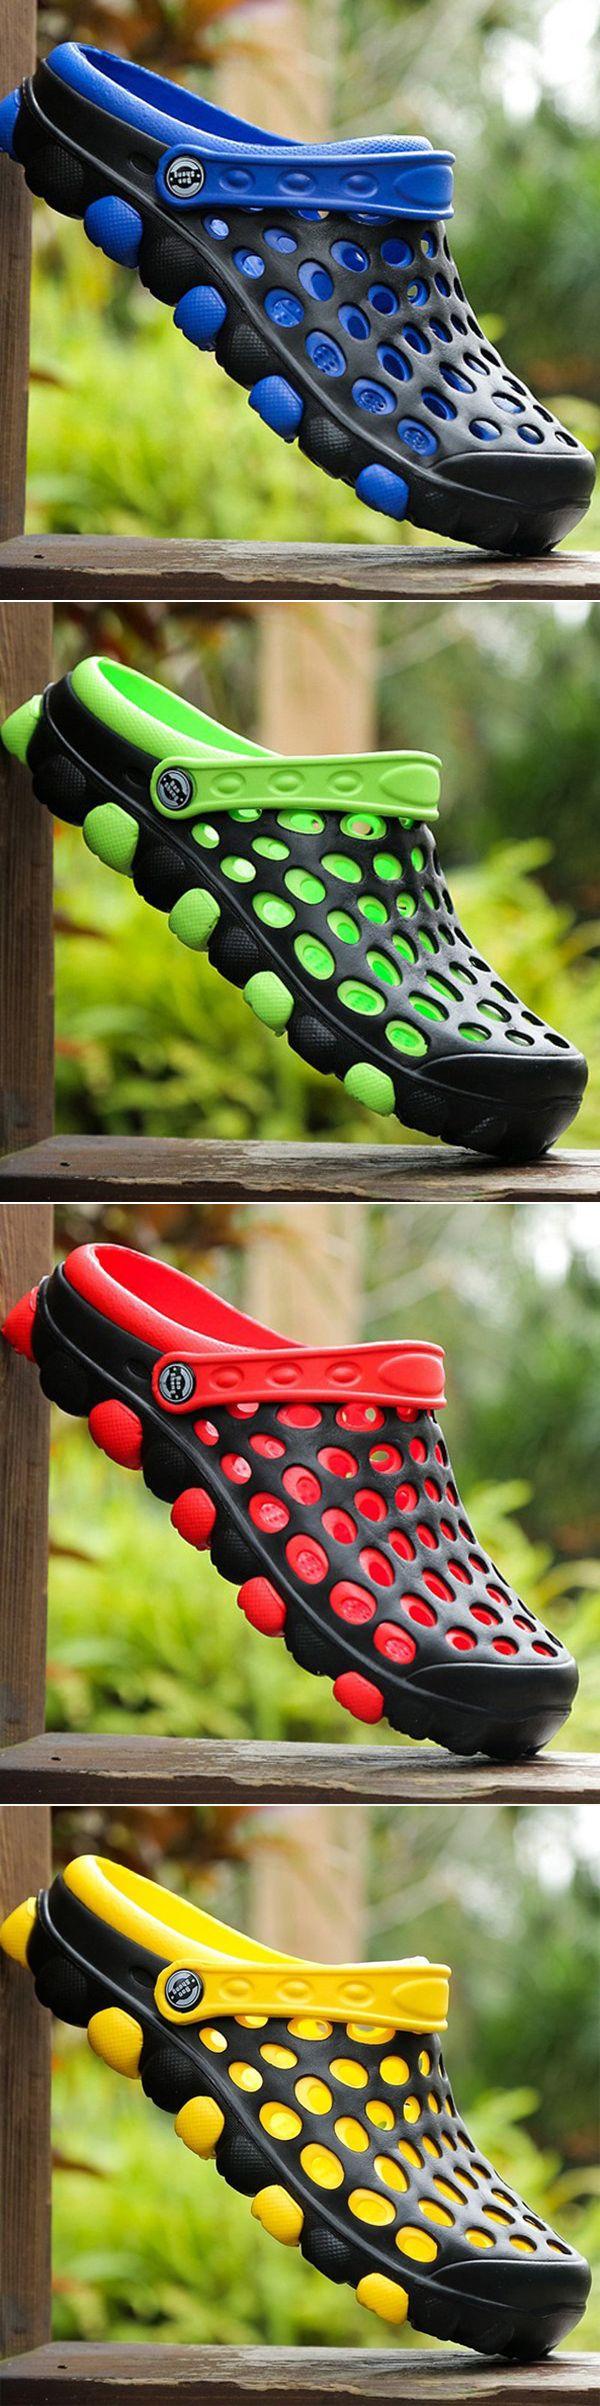 Men Hole Breathable Beach Sandals Slip On Waterproof Garden Shoes